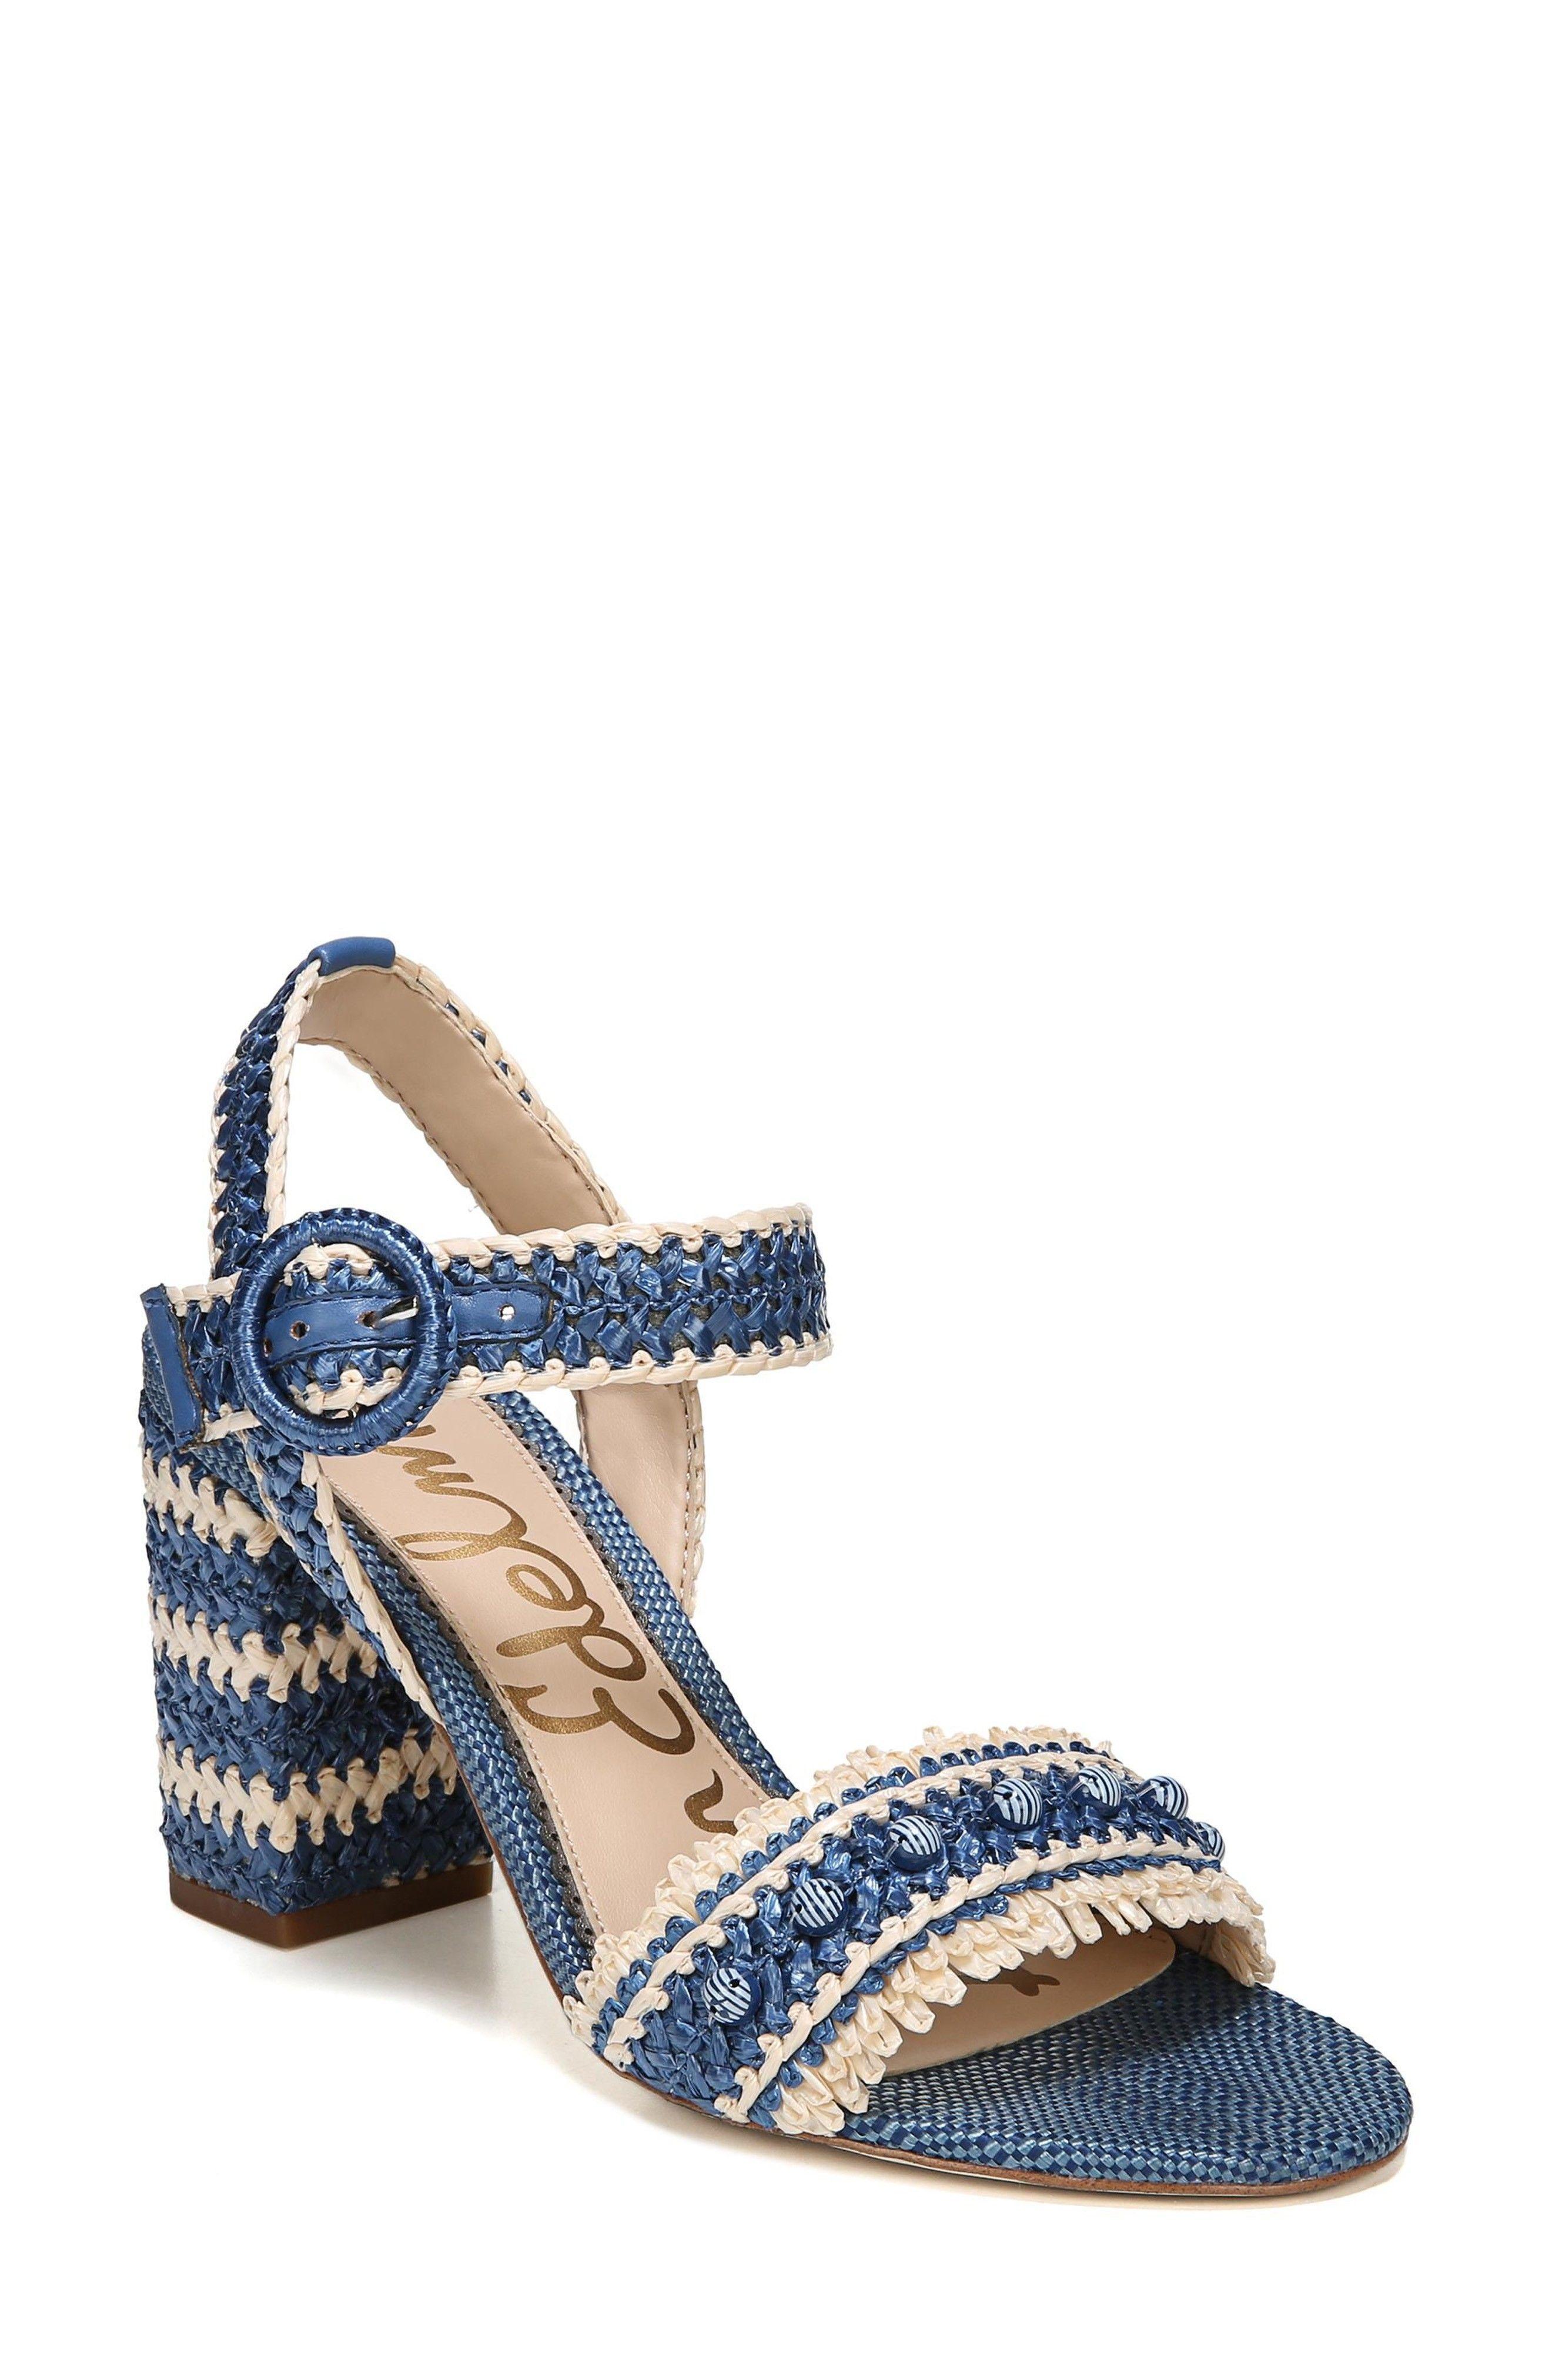 5307e8865be Buy SAM EDELMAN Olisa Block Heel Sandal online. New SAM EDELMAN Sandals.    119.95  SKU ITSP14853HHXB47810